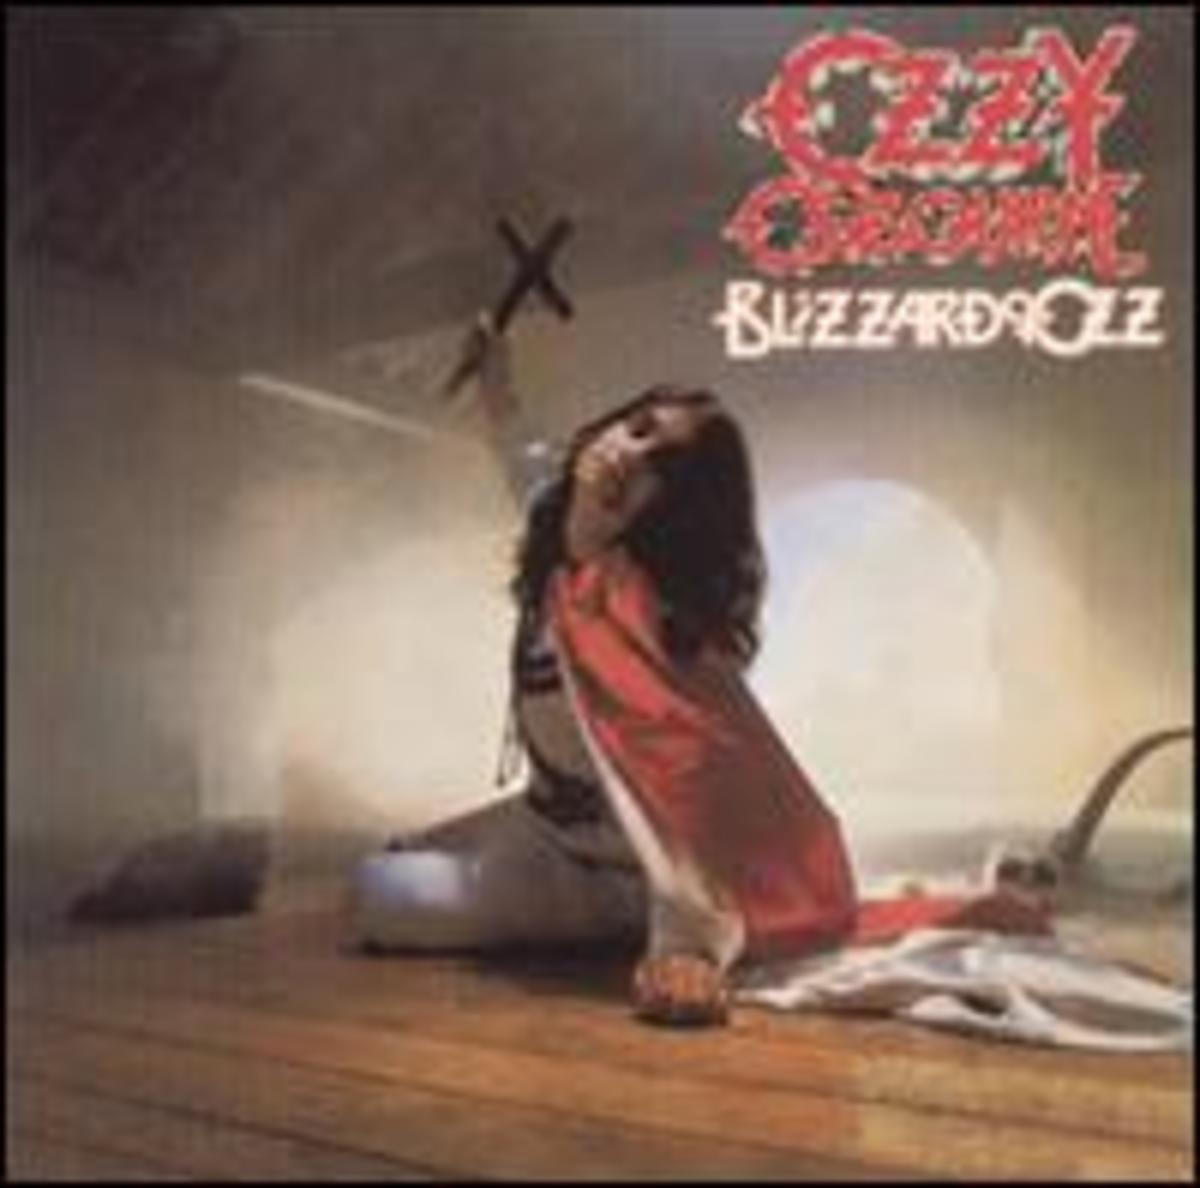 Blizzard_of_Ozz